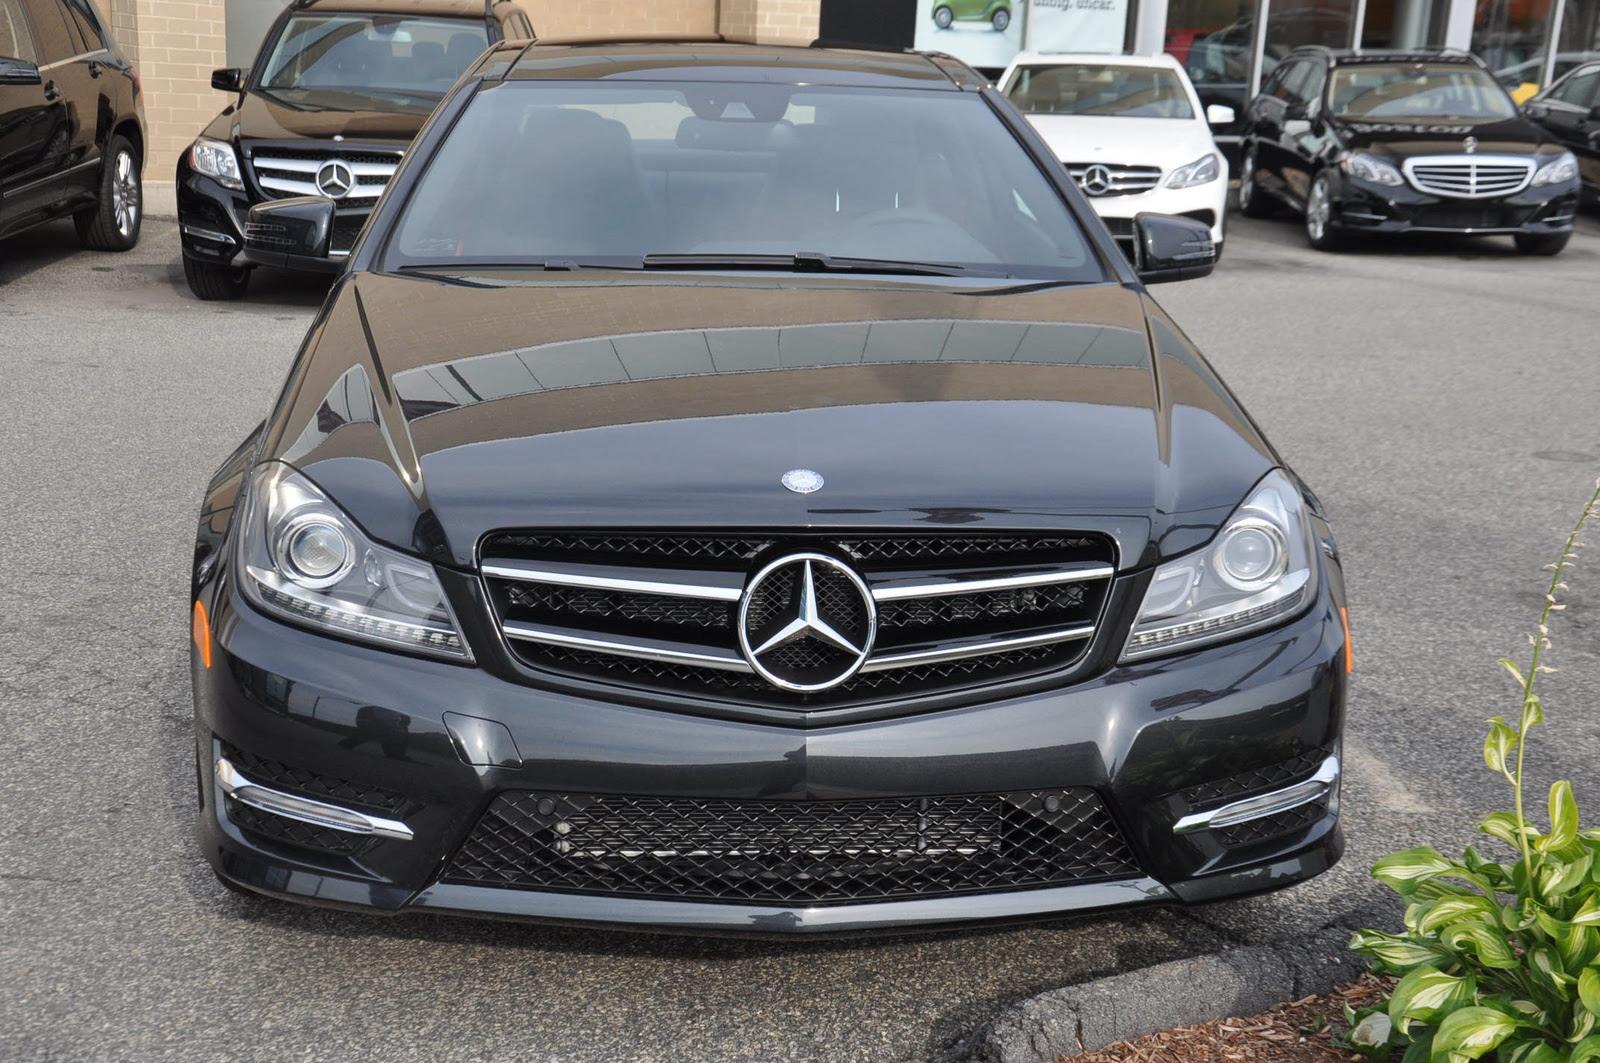 New 2014 / 2015 Mercedes-Benz C-Class For Sale - CarGurus